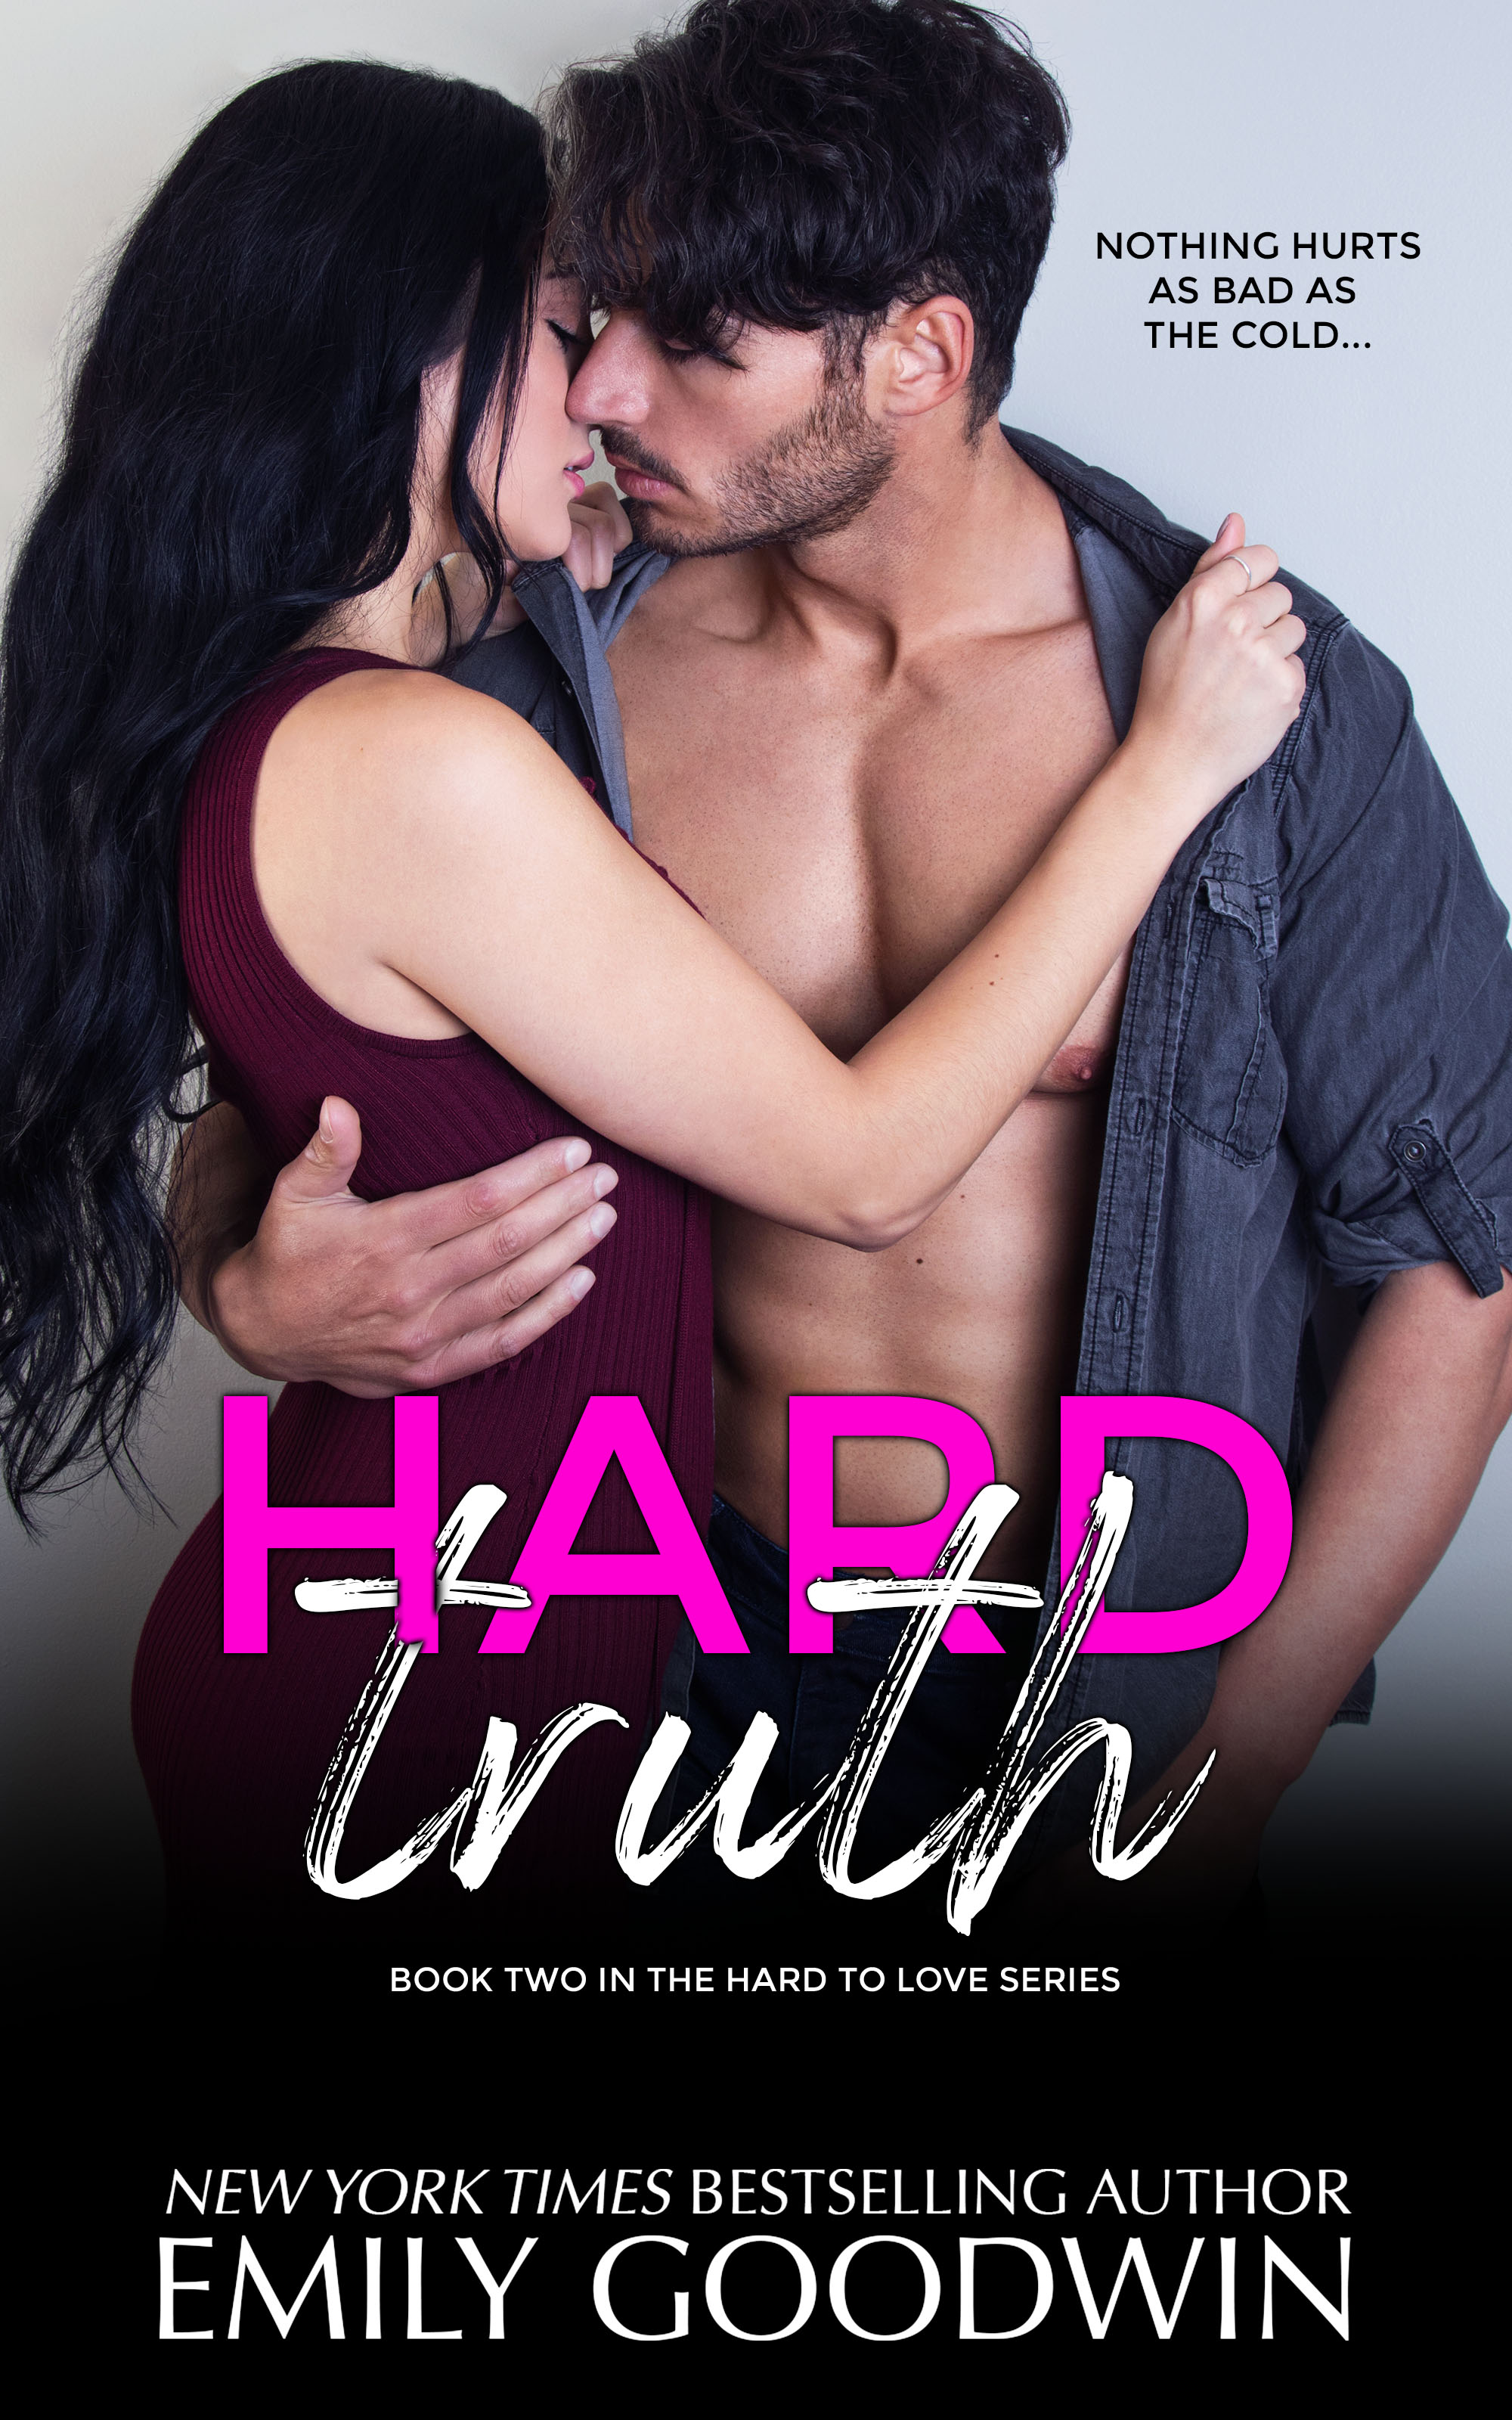 Hard Truth ebook.jpg